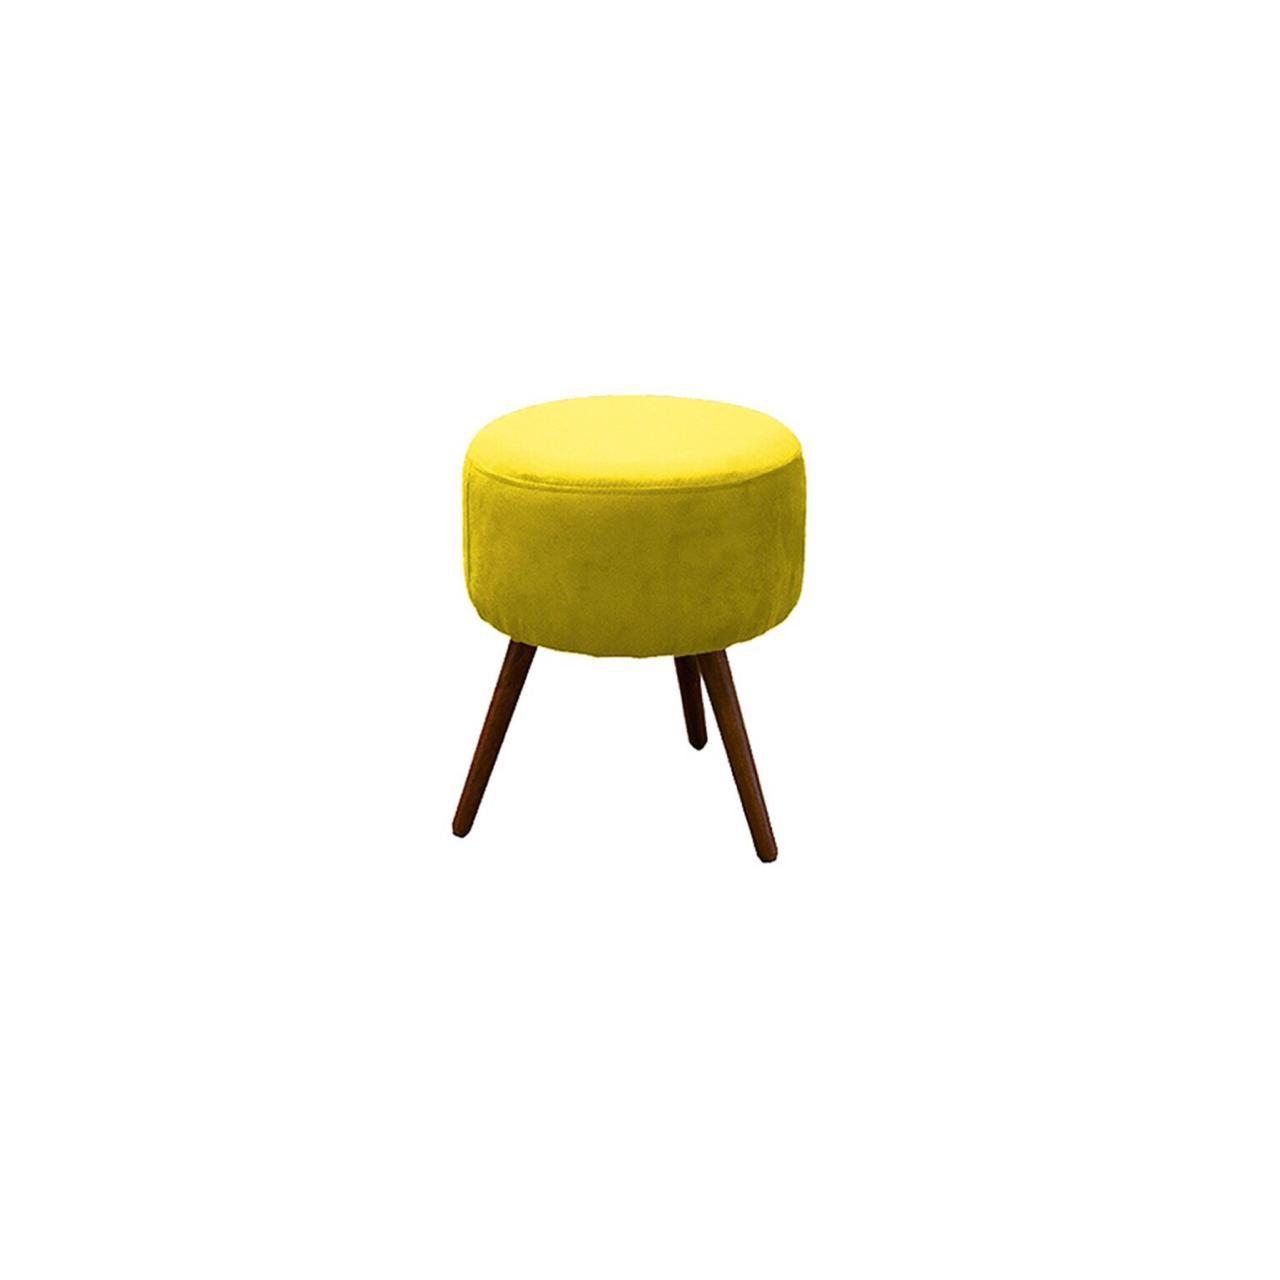 Kit Poltrona Decorativa Nina com rodapé e Puff redondo amarelo